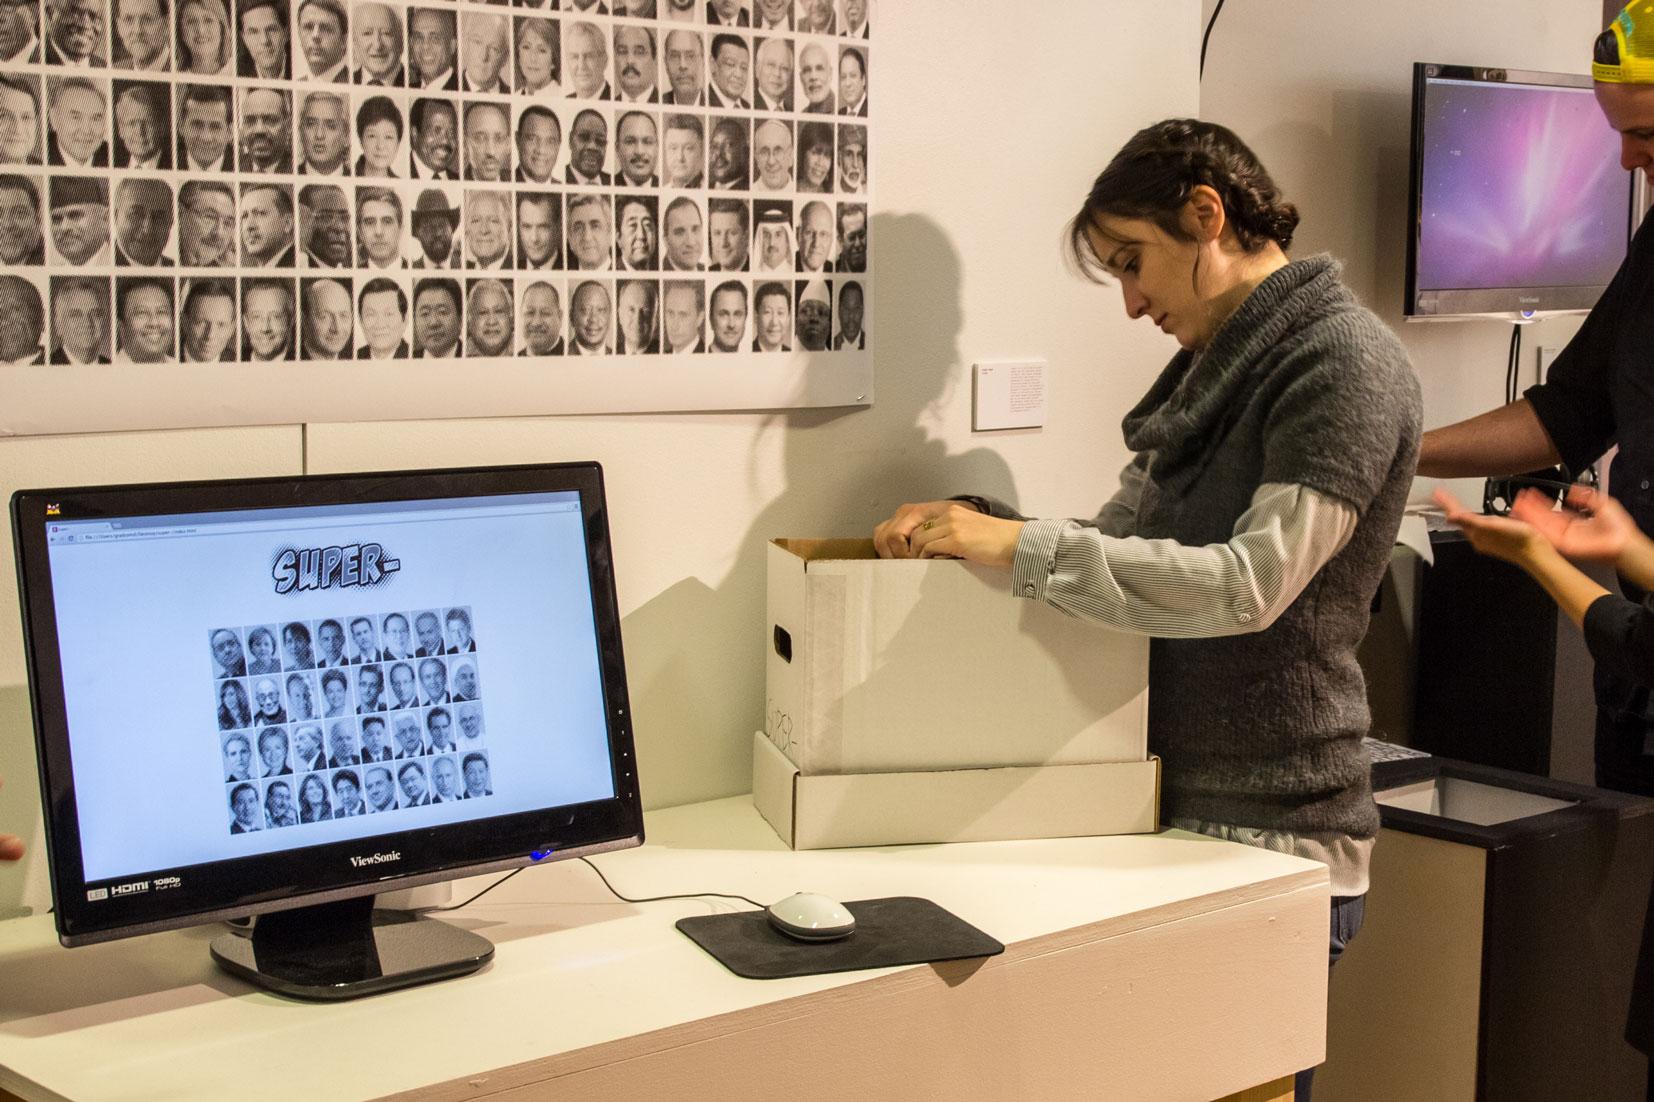 """_ology"" Exhibition, Dec 4th 2015 Pratt Institute Manhattan Campus Gallery"